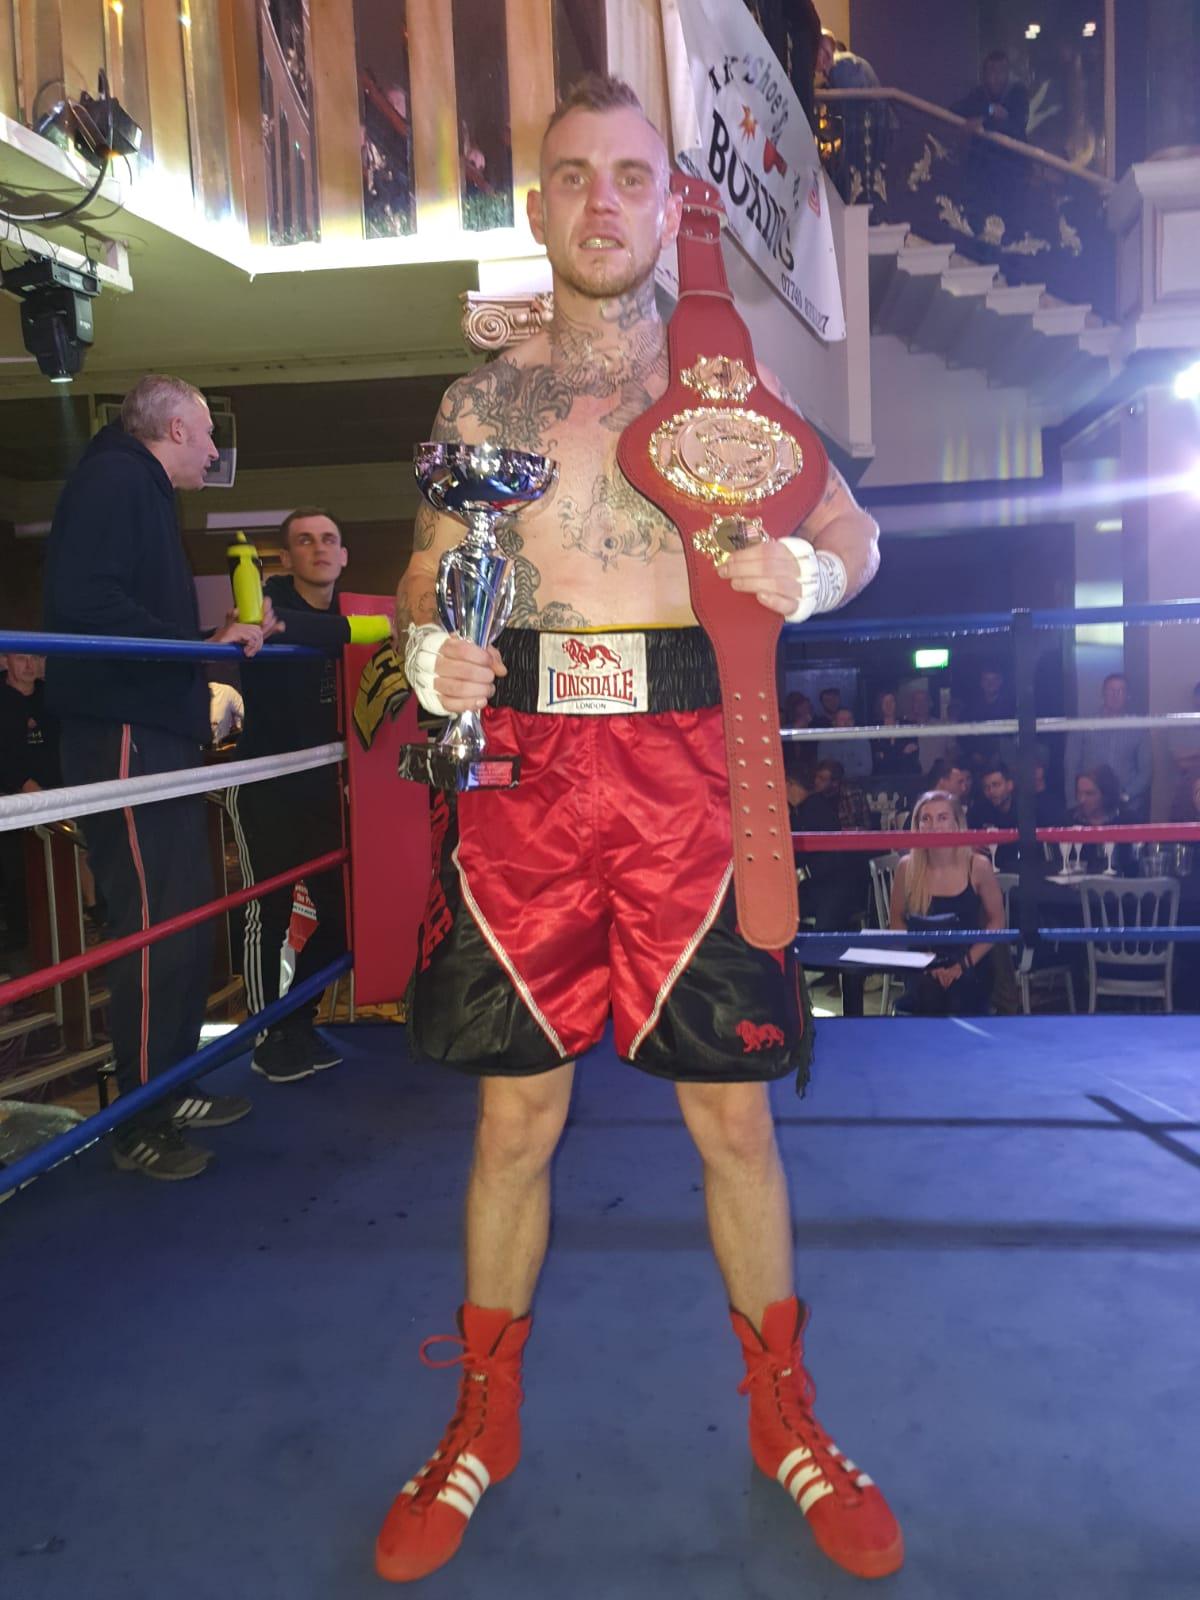 Jordan Candlin New Area Champ